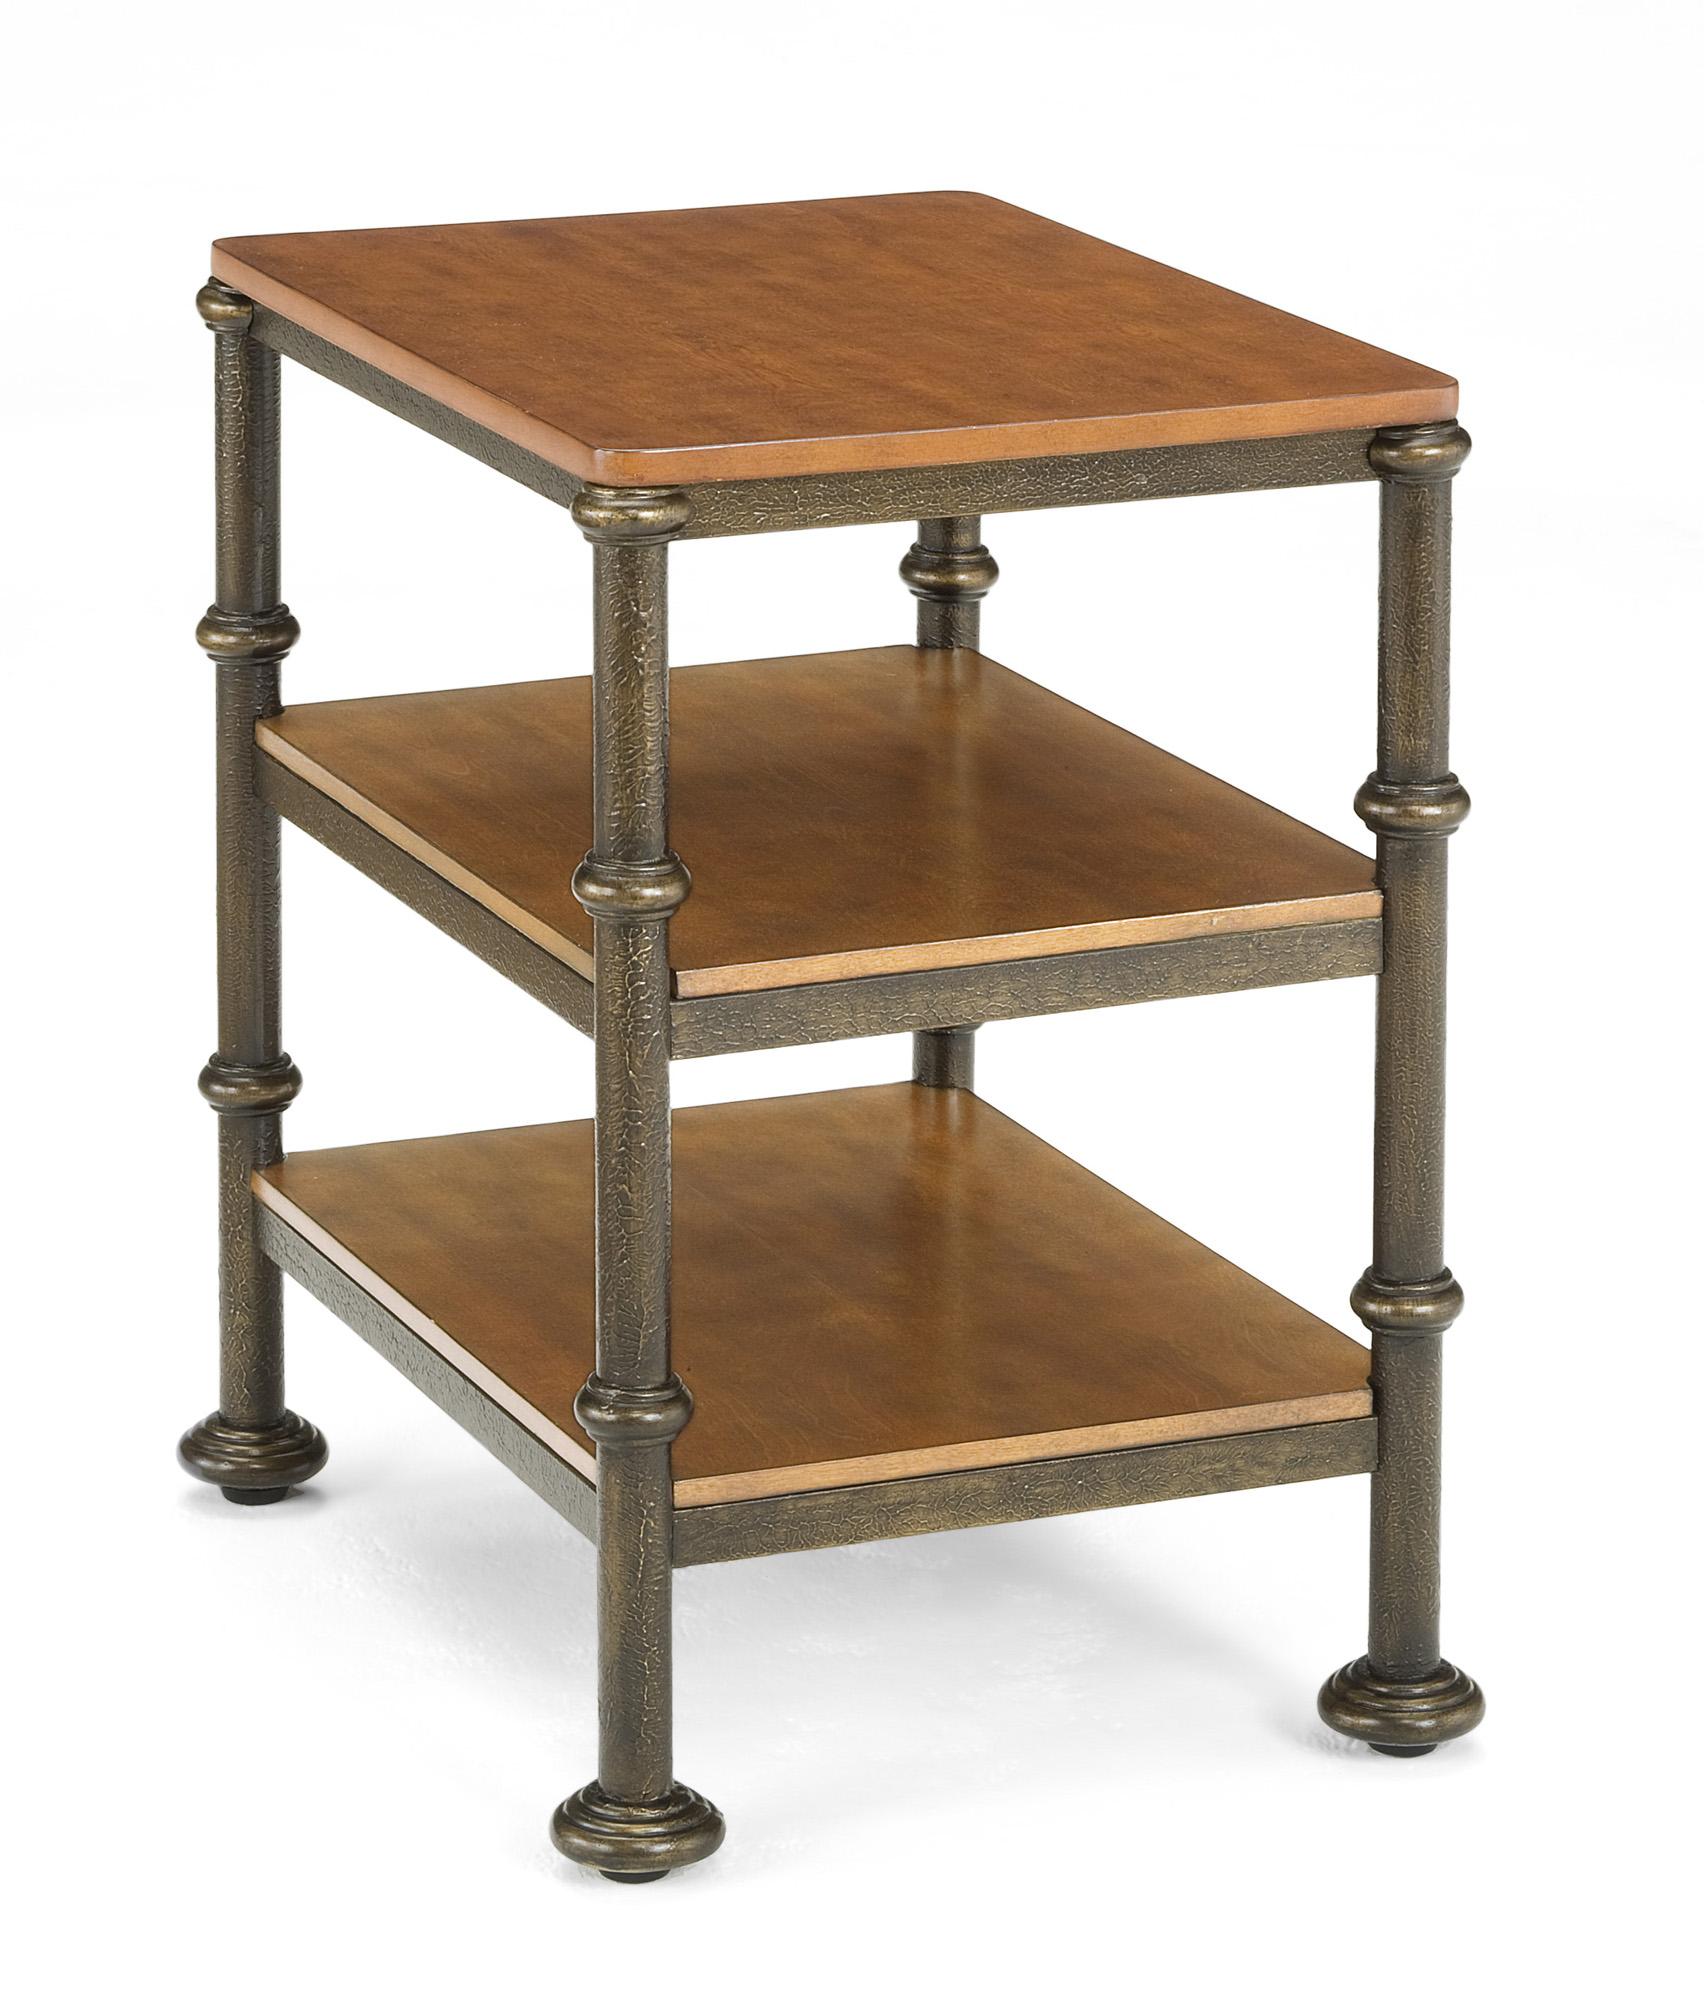 Bentley oak metal side table bernards home gallery stores